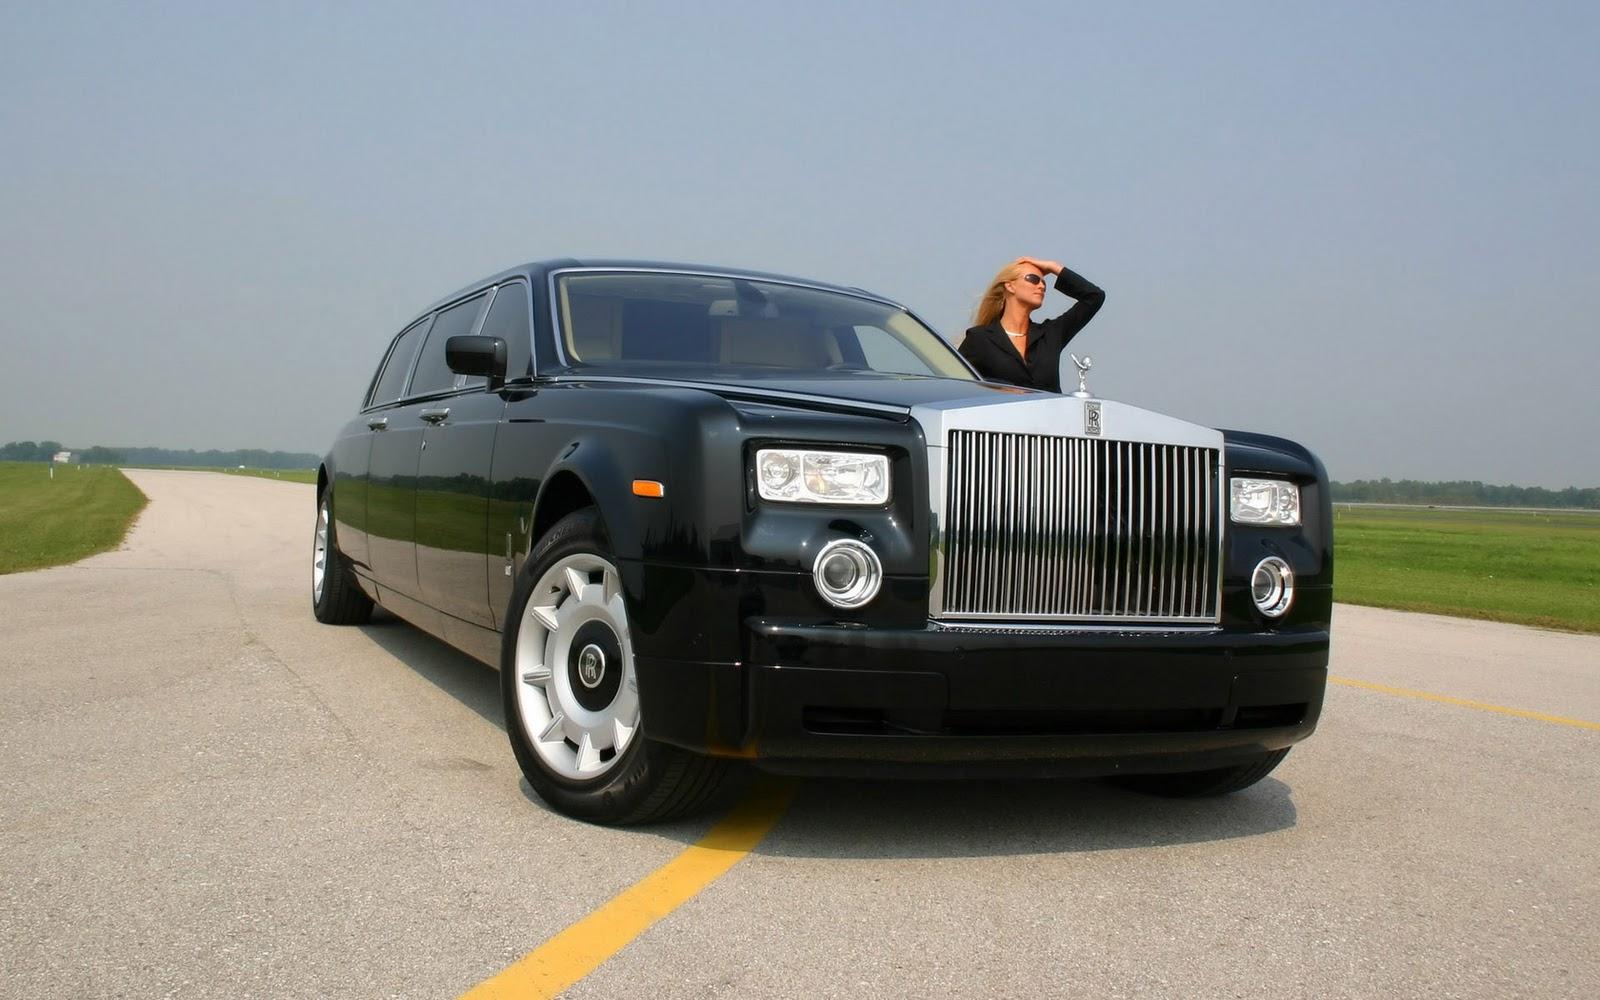 http://3.bp.blogspot.com/-0NBd30DKJes/Tr54TbDW-SI/AAAAAAAAAT0/_Oj2G7DheG0/s1600/Rolls-Royce-Wallpaper-%252812%2529.jpg